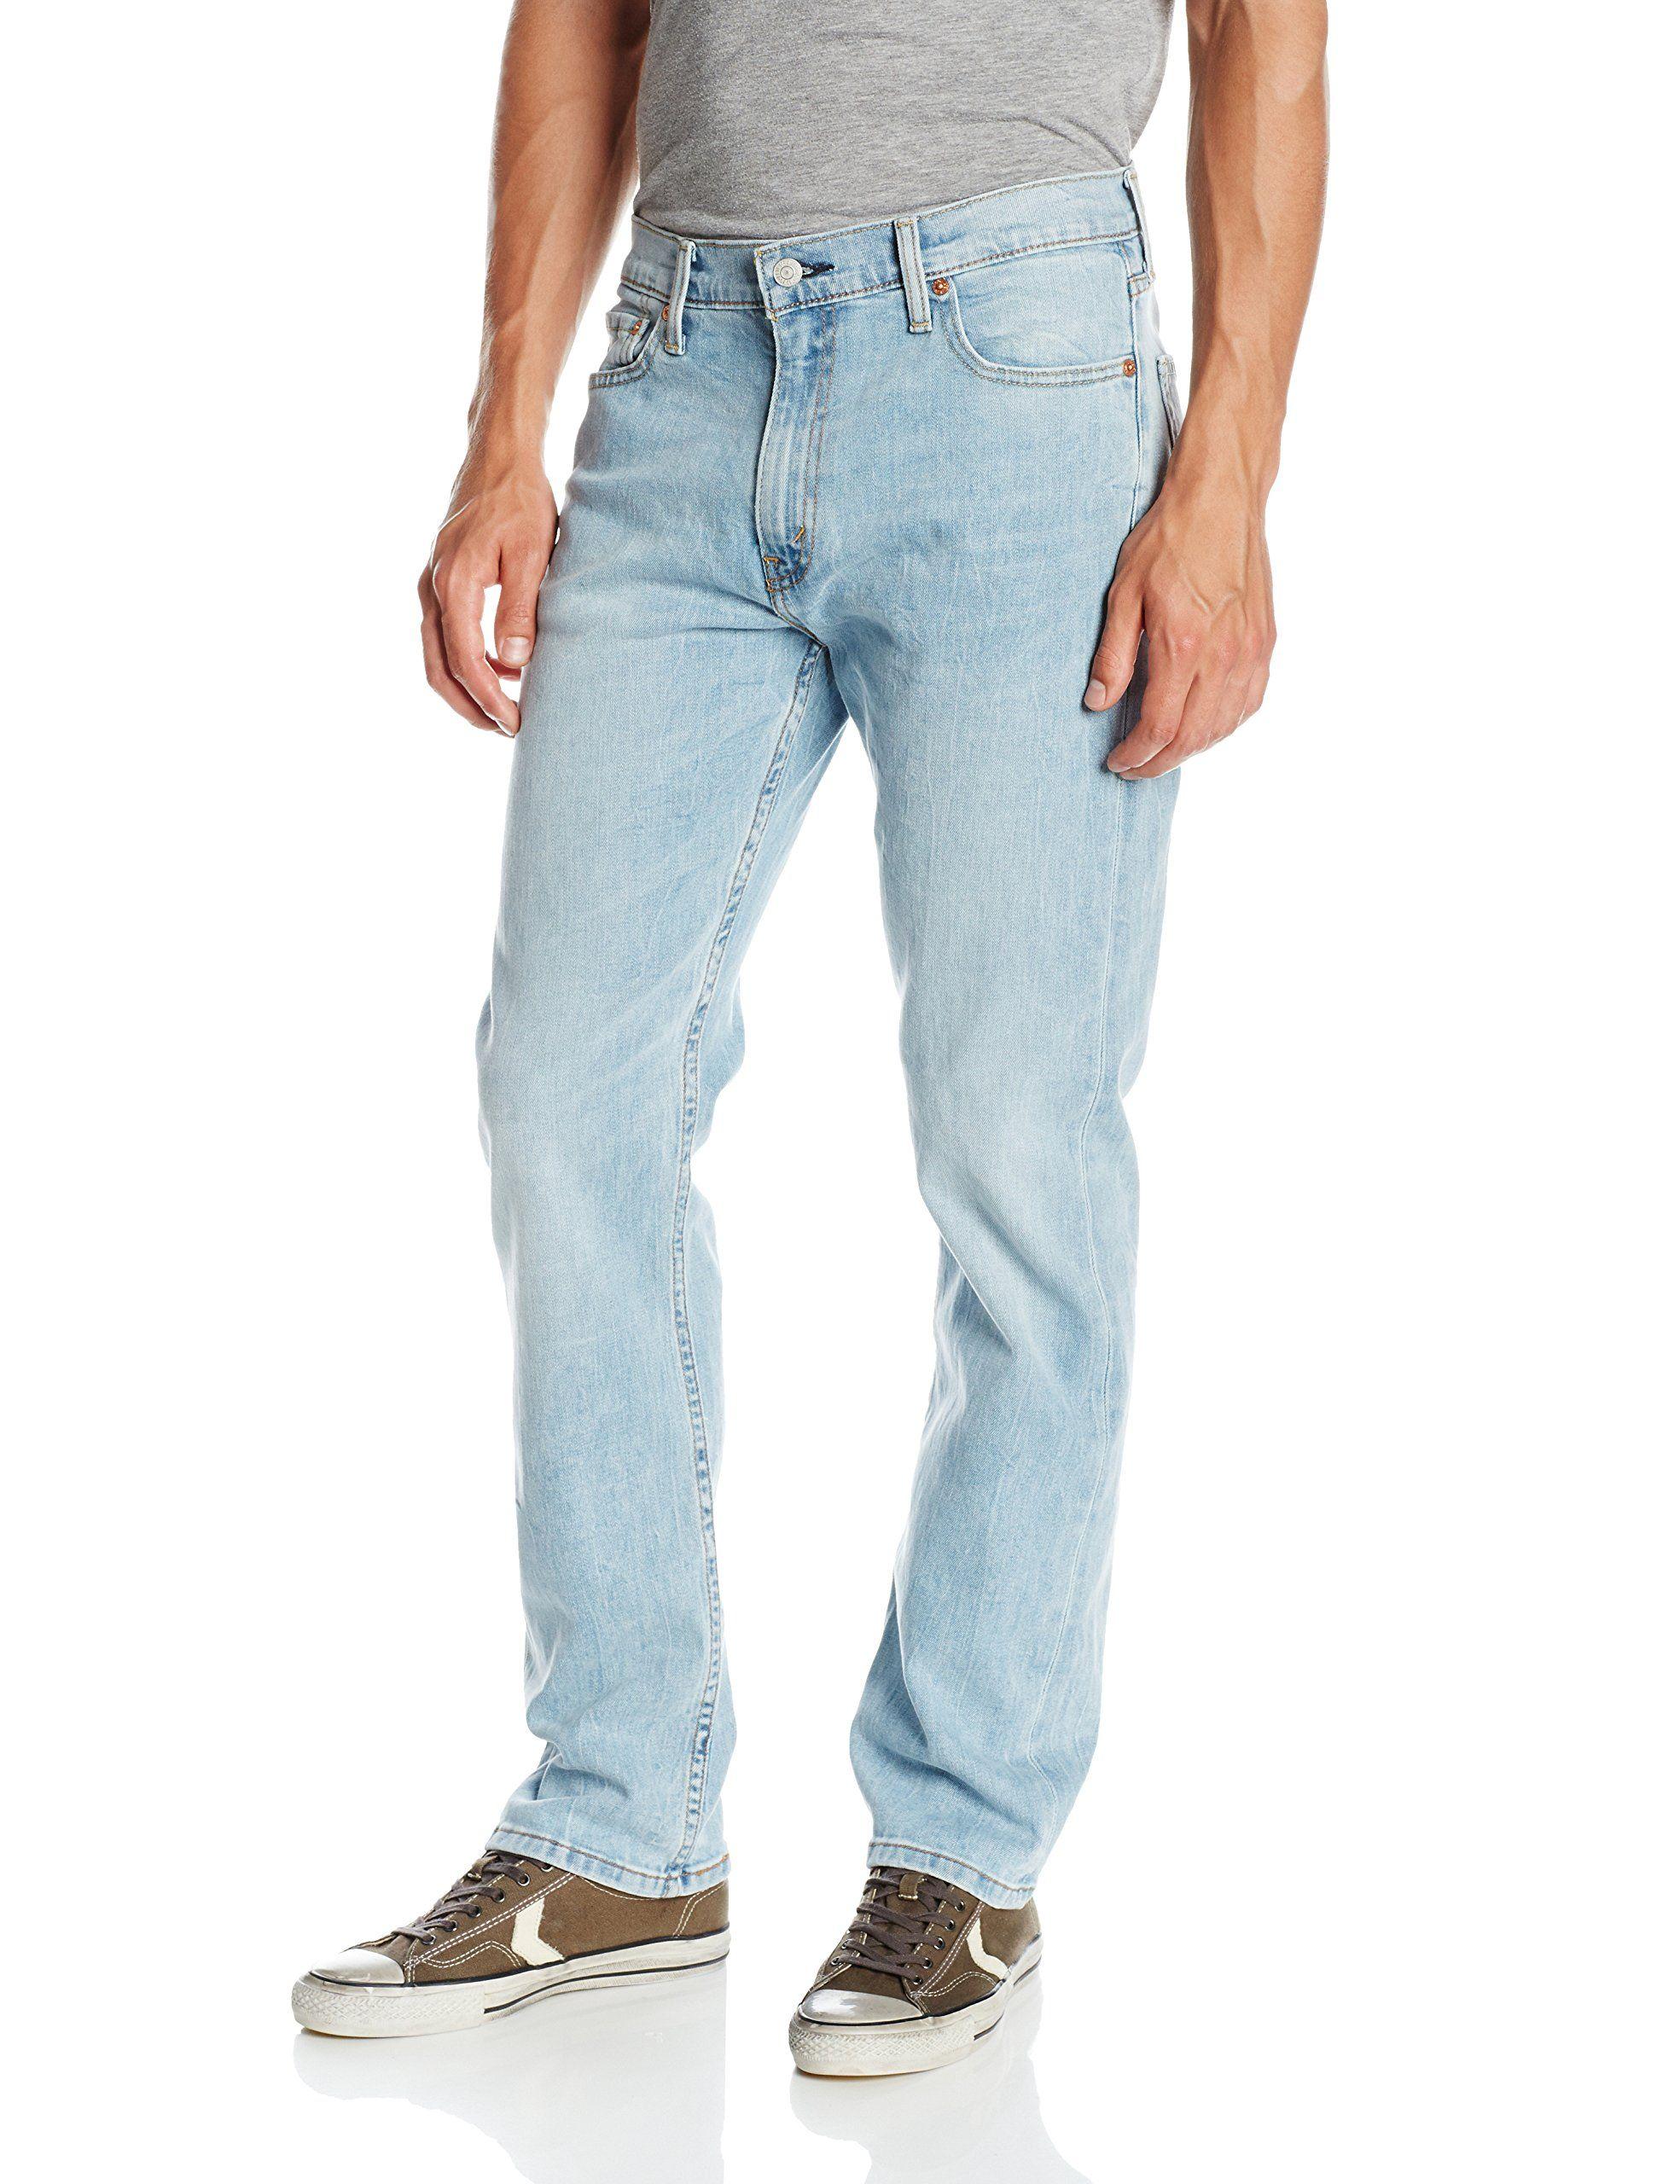 ae545348e513ef Levi's Men's 513 Slim Straight Jean, Blue Stone, 36x32 | jeans ...